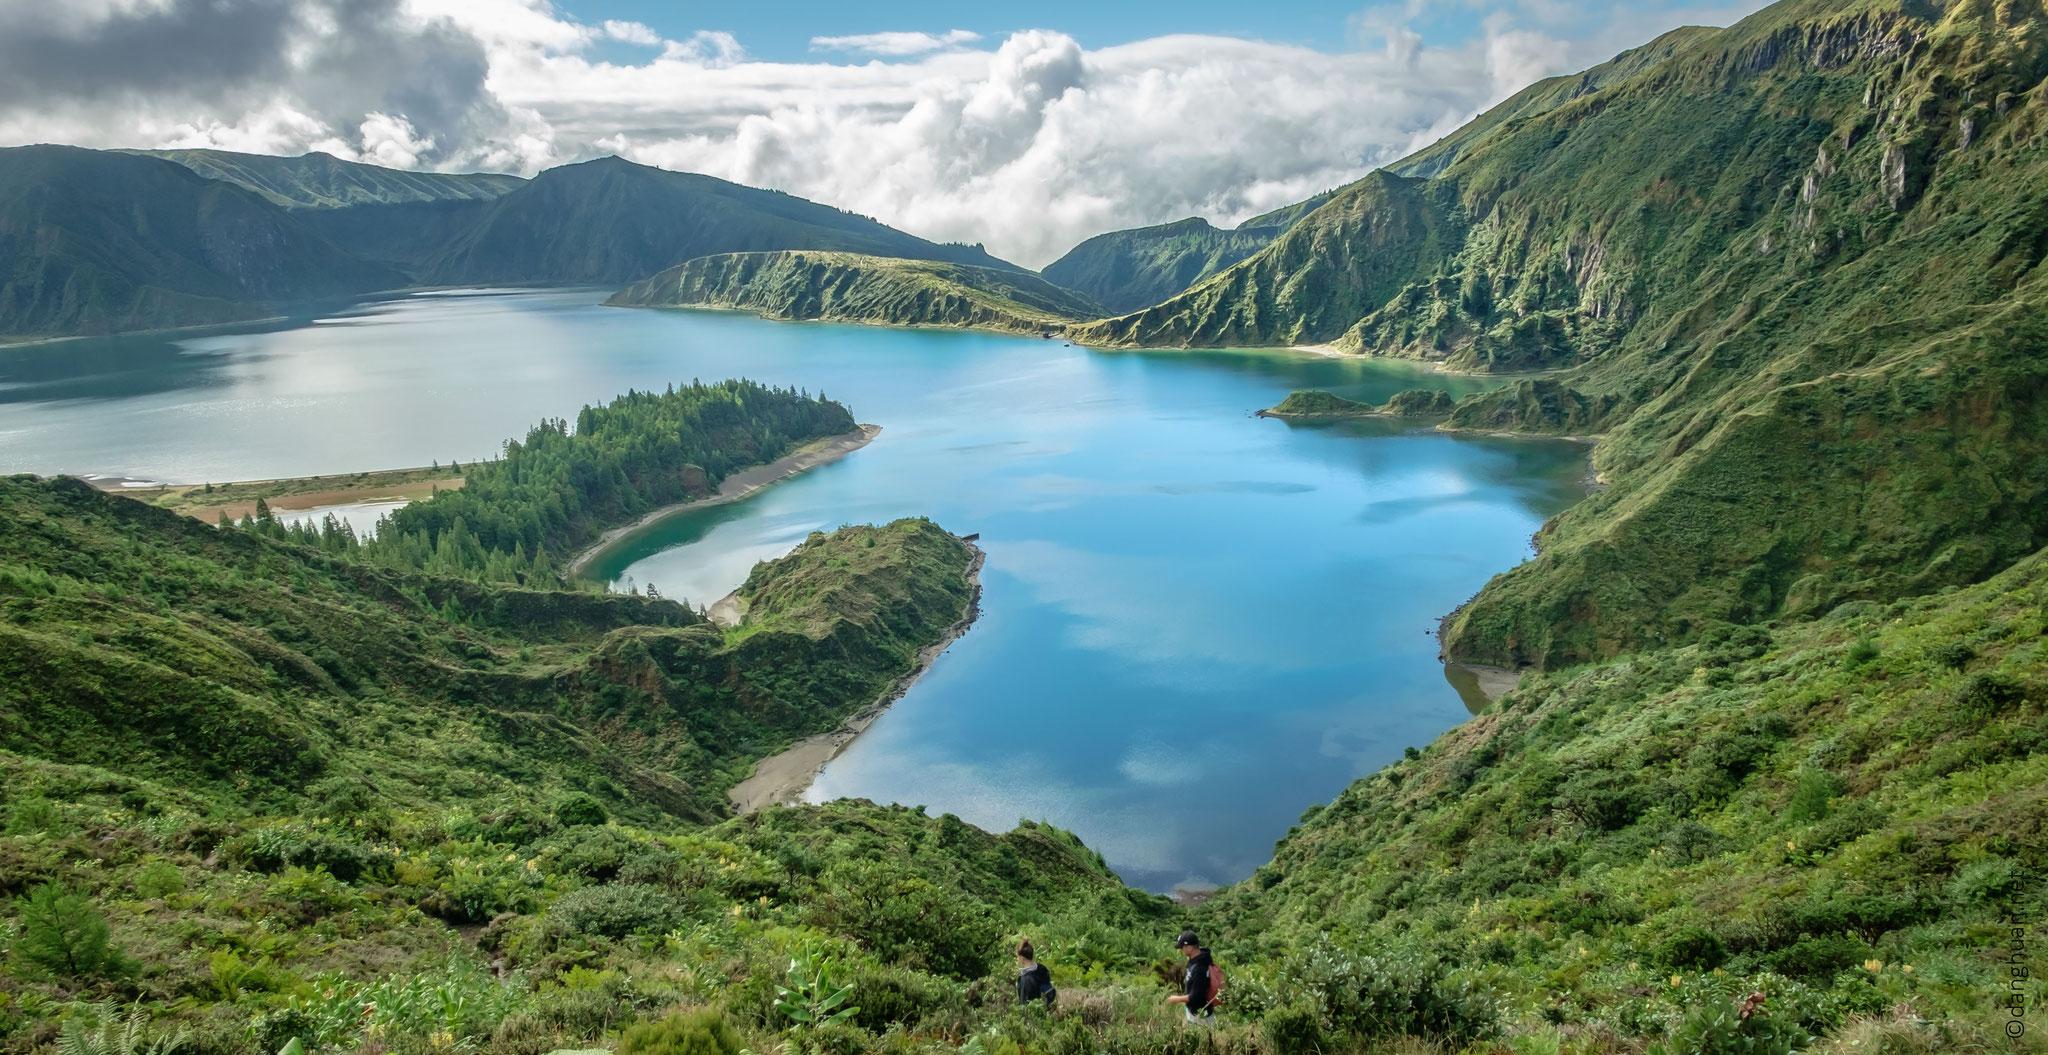 Lago do Fogo - descente vers le lac